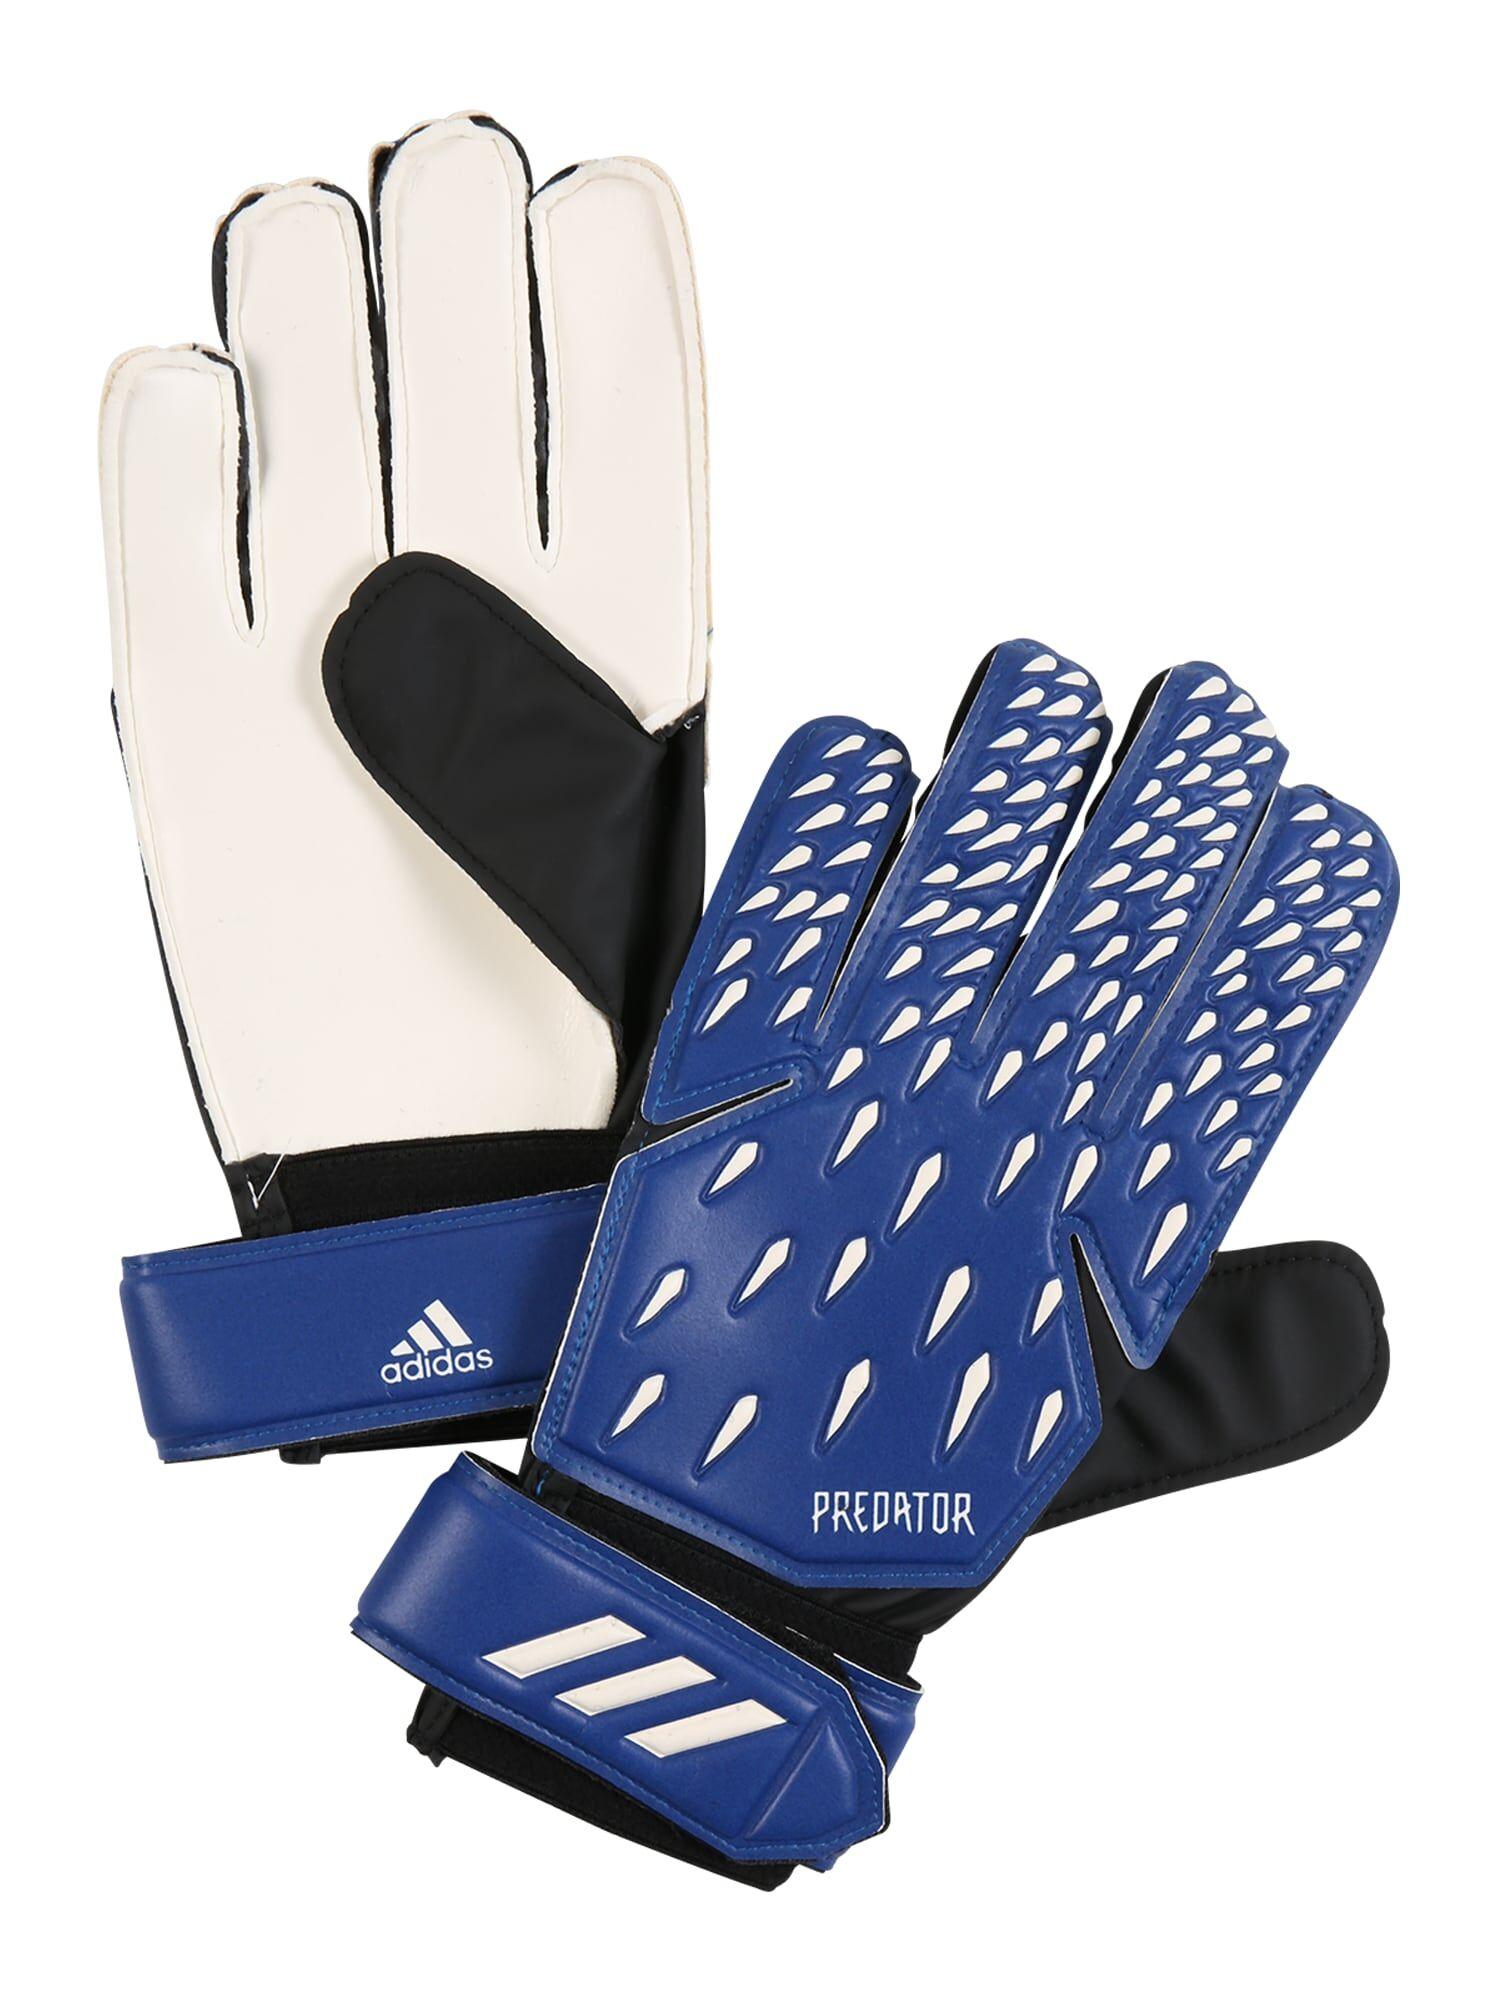 ADIDAS PERFORMANCE Gants de sport 'Predator'  - Bleu, Blanc - Taille: 11 - male